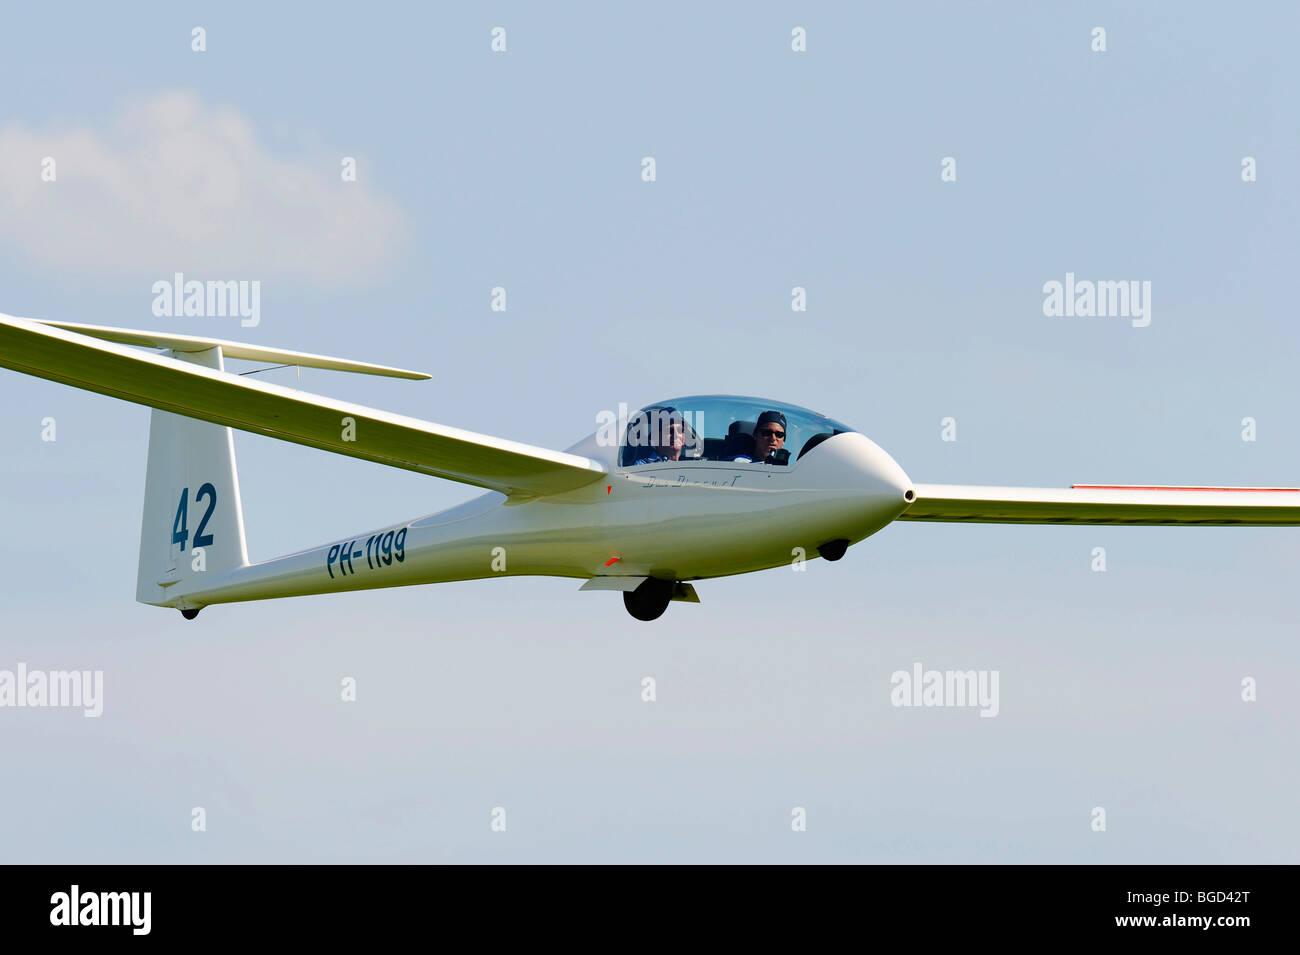 Glider - Stock Image